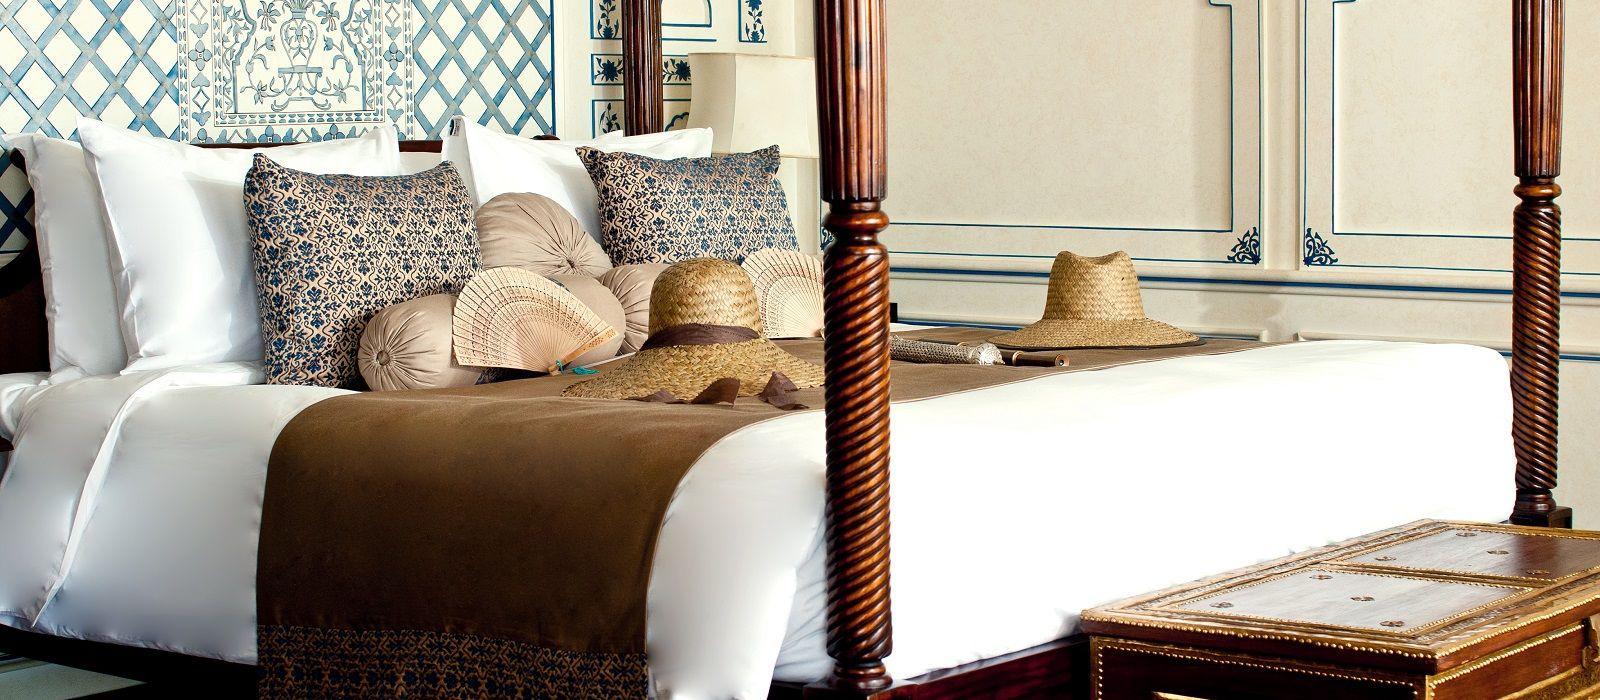 Hotel The Jahan Cruise 3N/4D: My Tho – Phnom Penh Vietnam